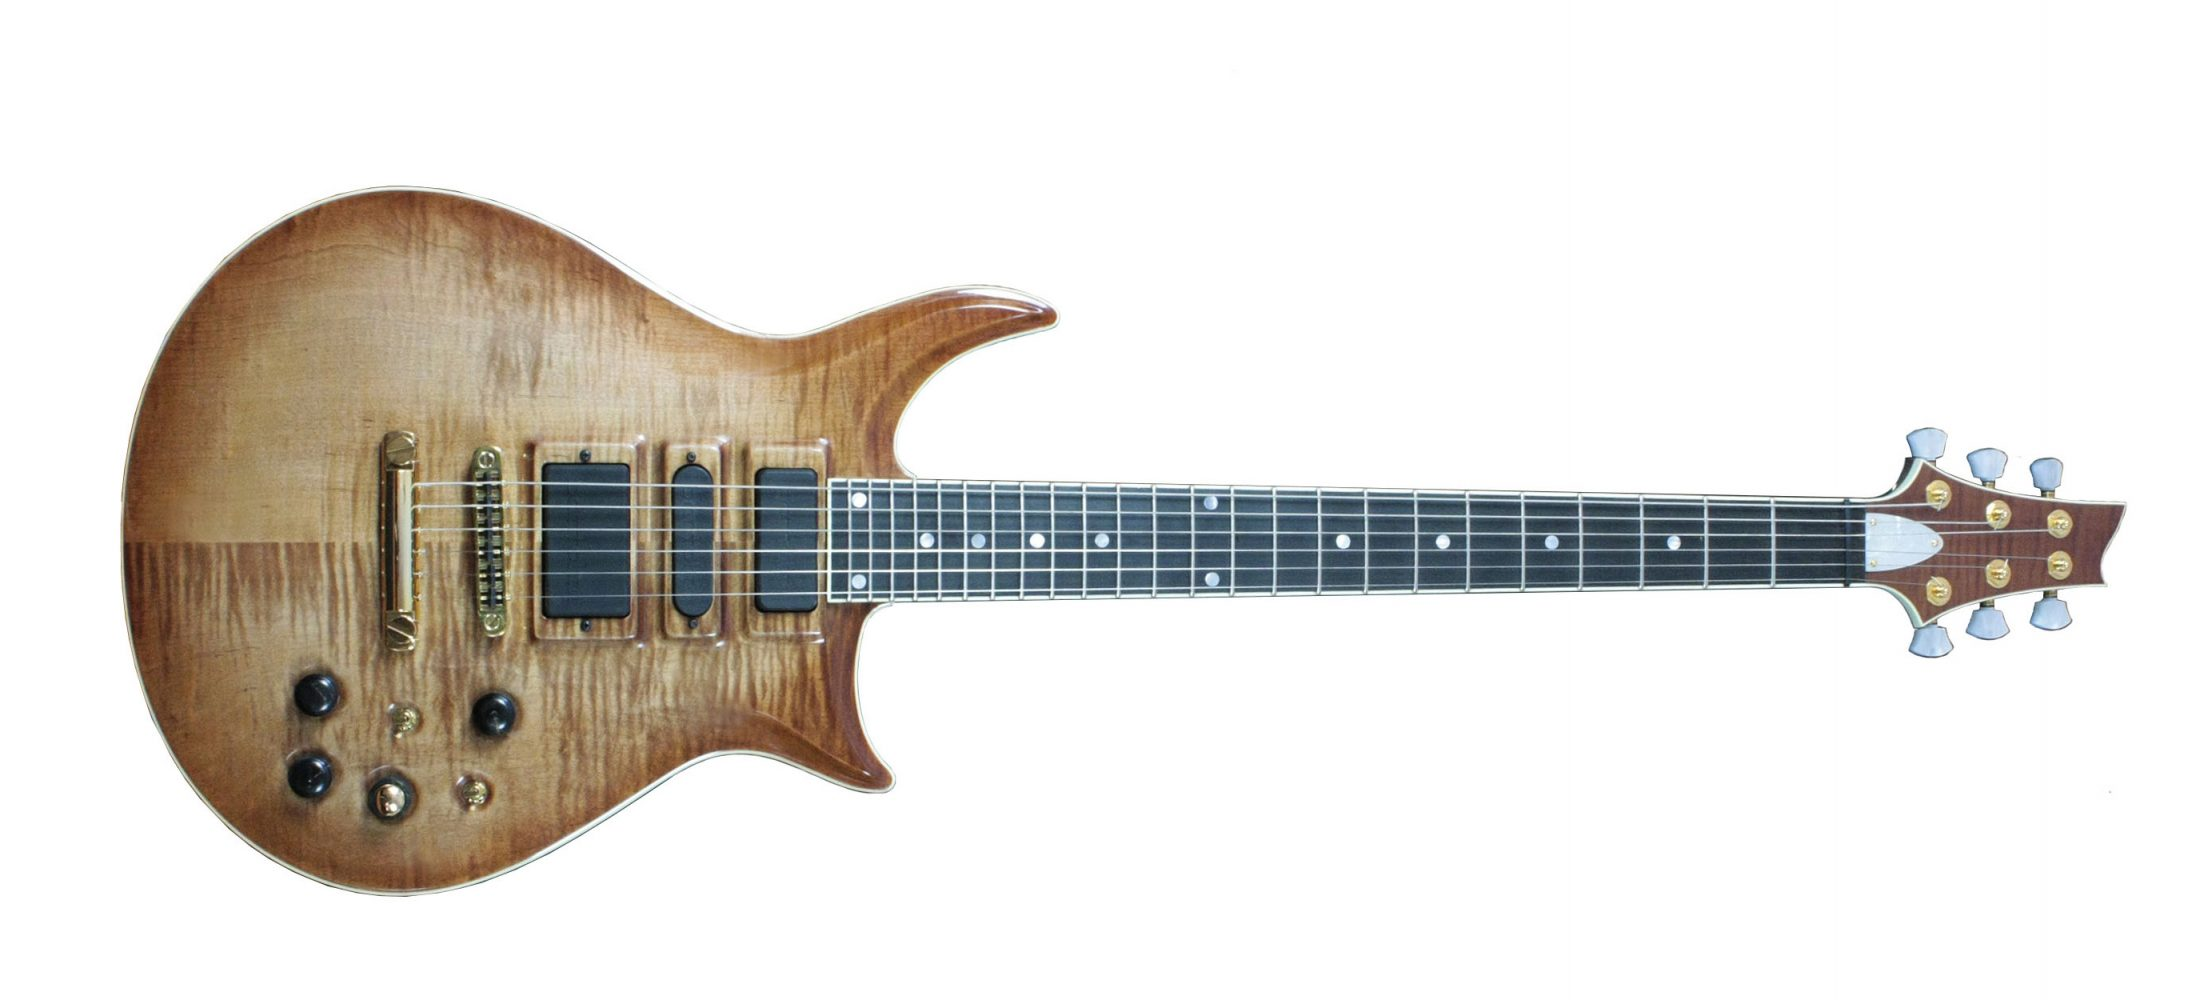 Windsor Heirloom Guitar and Amp